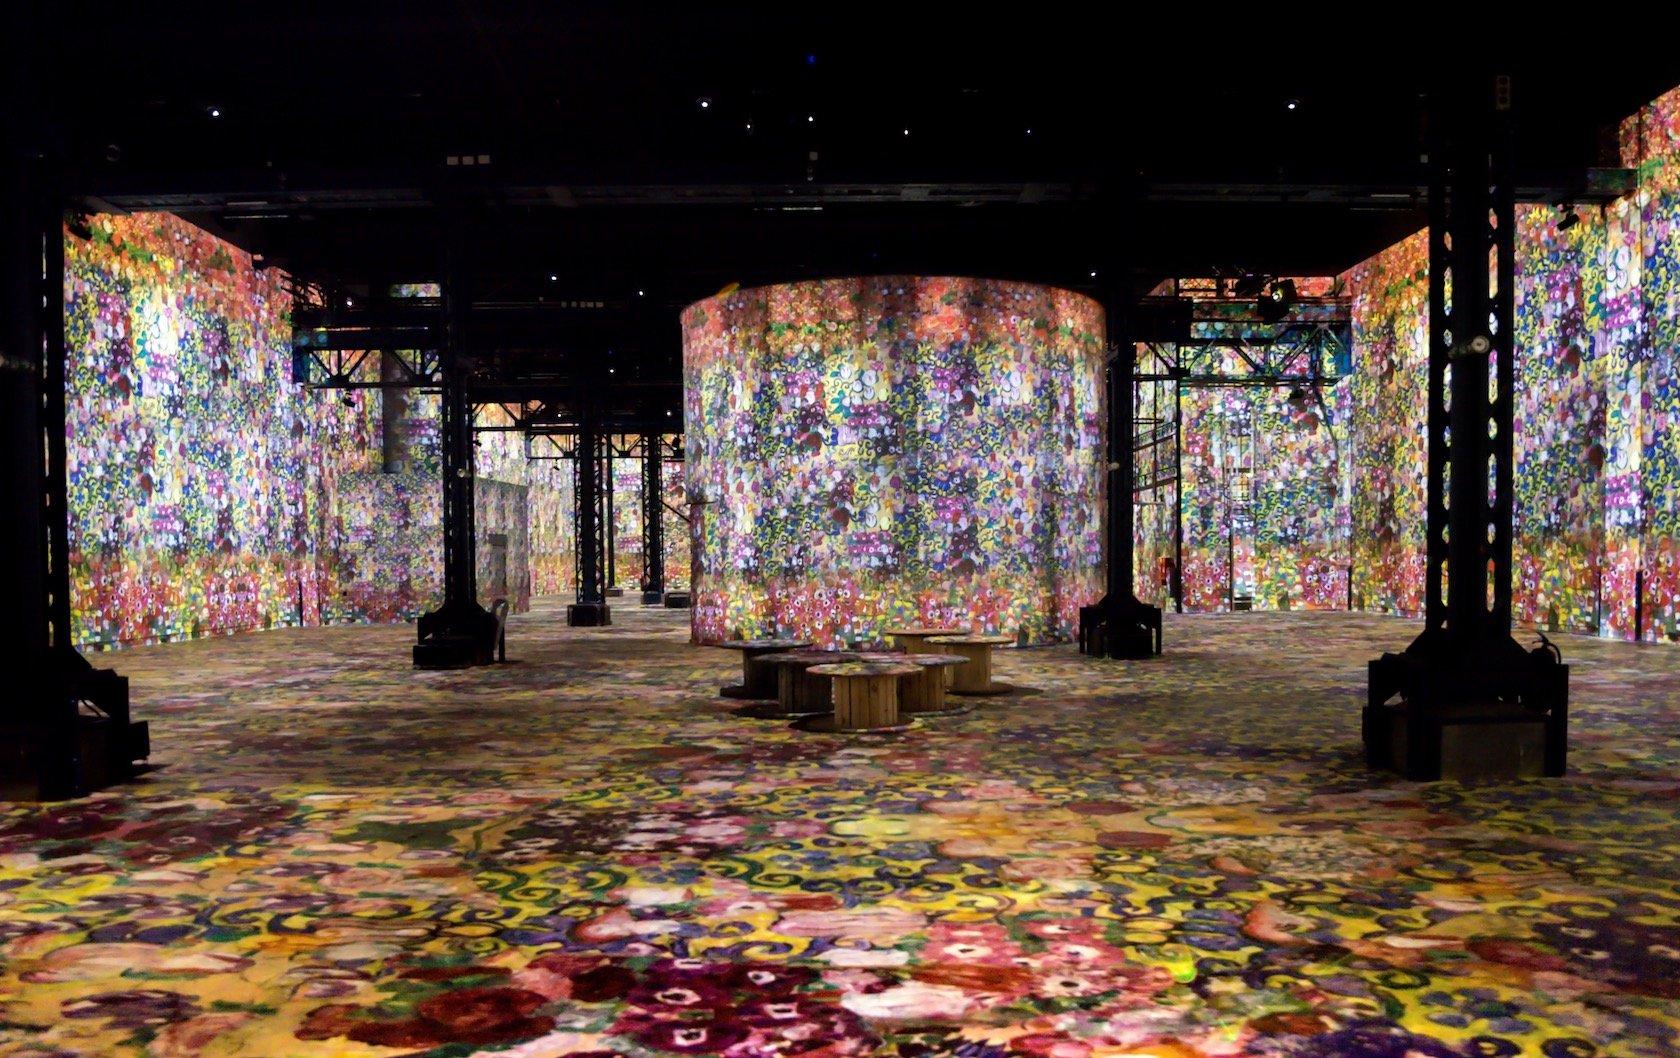 Atelier des Lumières و Musée Yves Saint Laurent: قم بزيارة هذه المتاحف الجديدة في باريس بقلم Paris Perfect